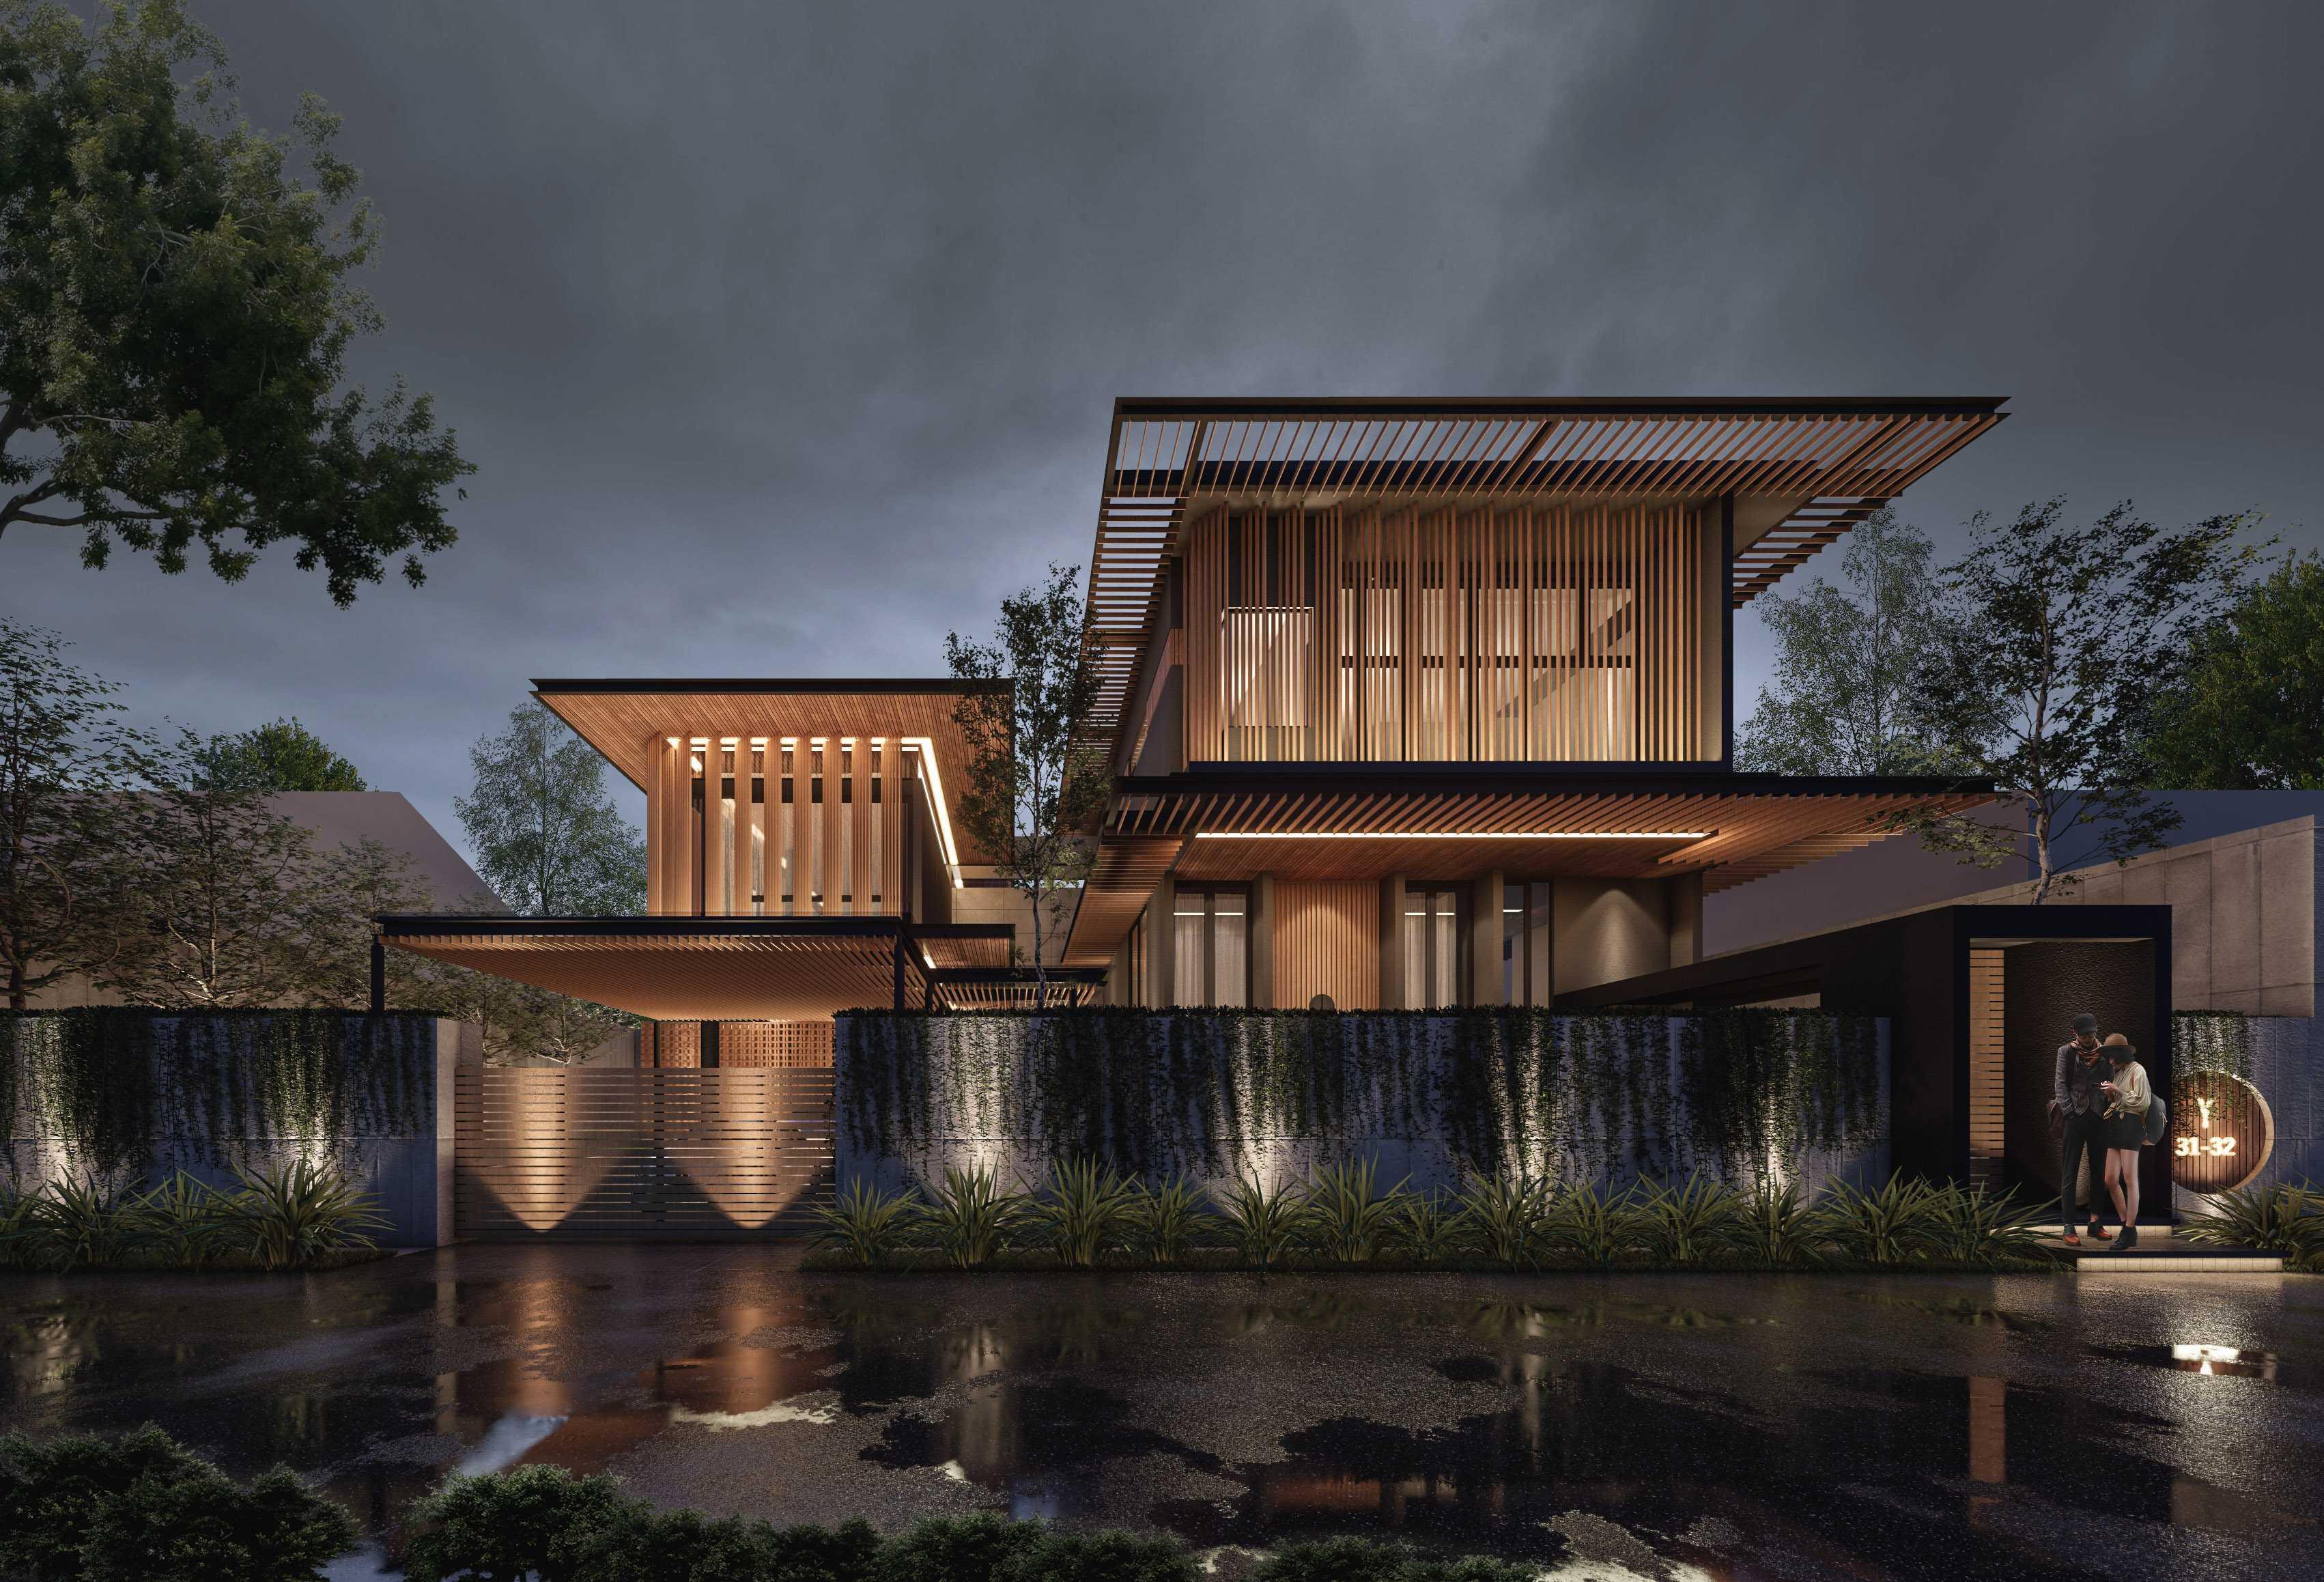 Mahastudio & Partner Y House Palembang, Kota Palembang, Sumatera Selatan, Indonesia Palembang, Kota Palembang, Sumatera Selatan, Indonesia Mahastudio-Partner-Y-House   97224